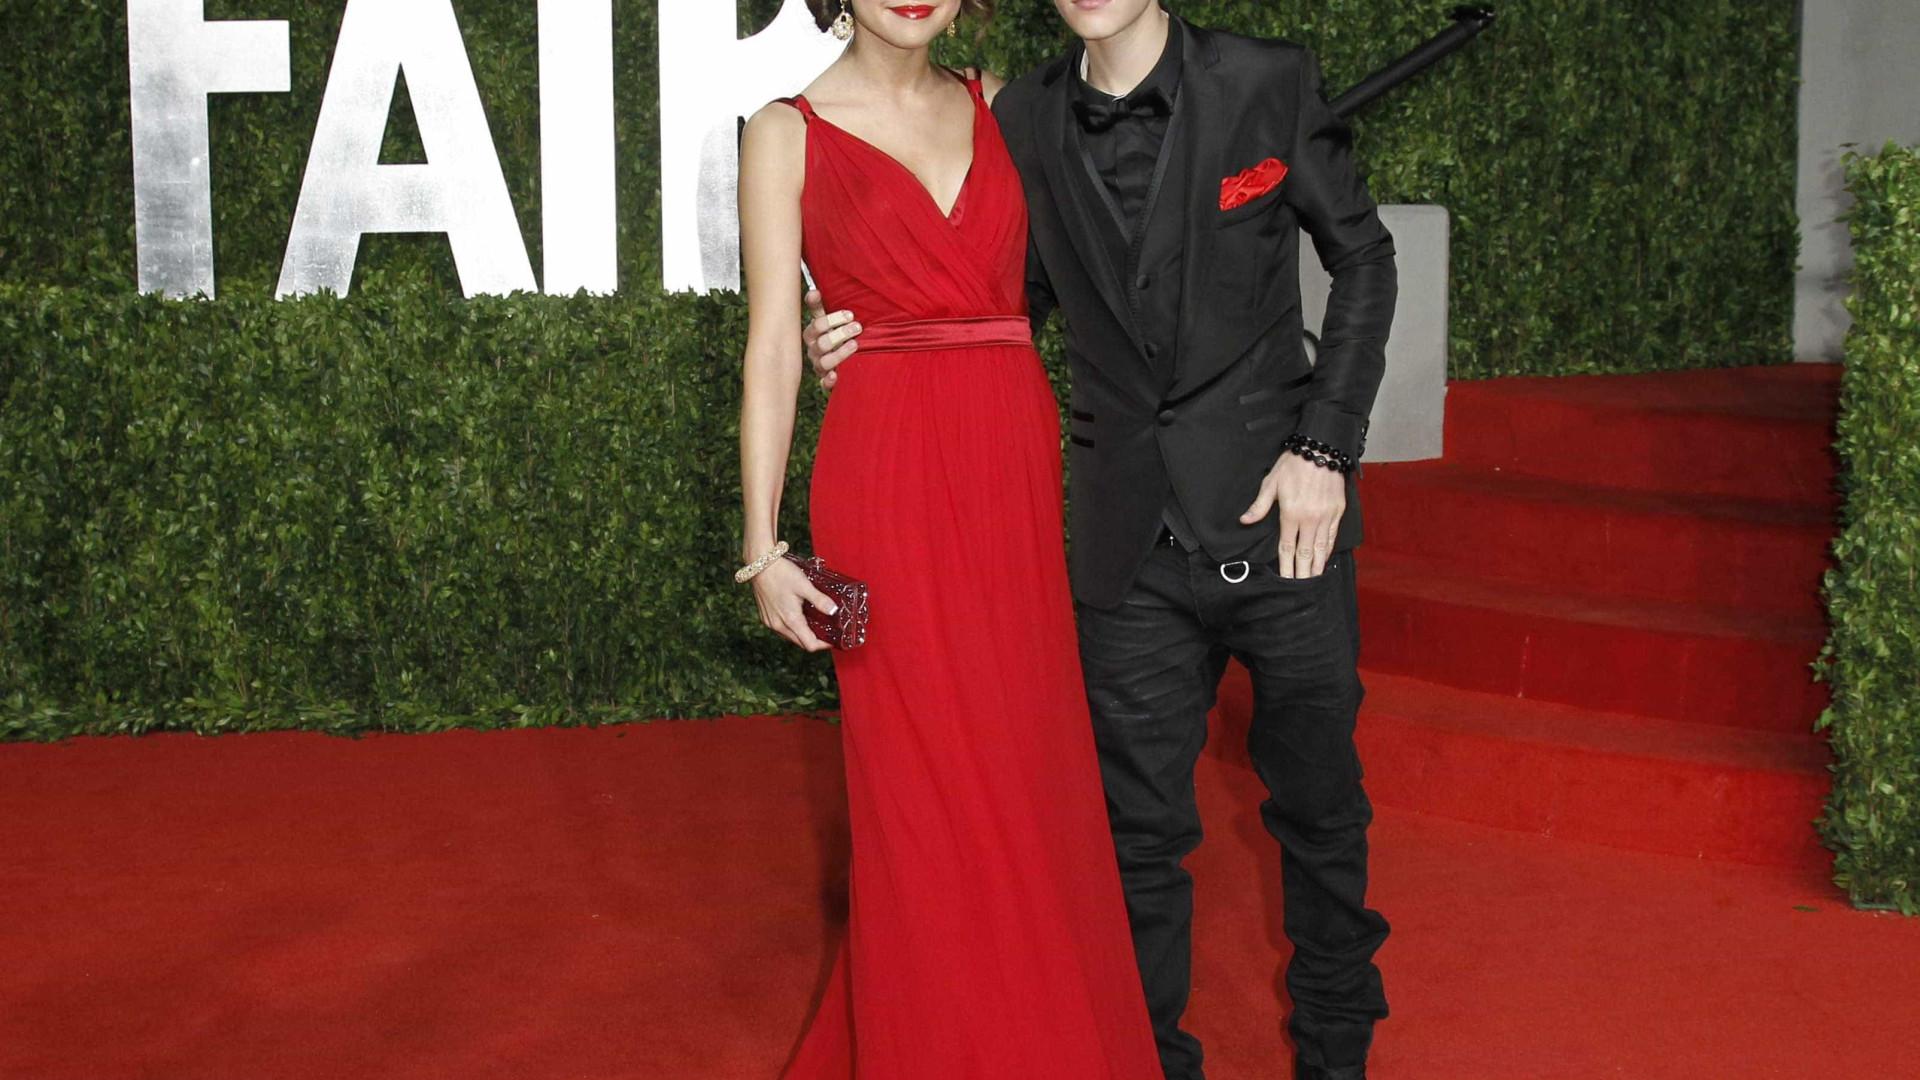 Selena Gomez disposta a voltar para Justin Bieber caso o noivado acabe?